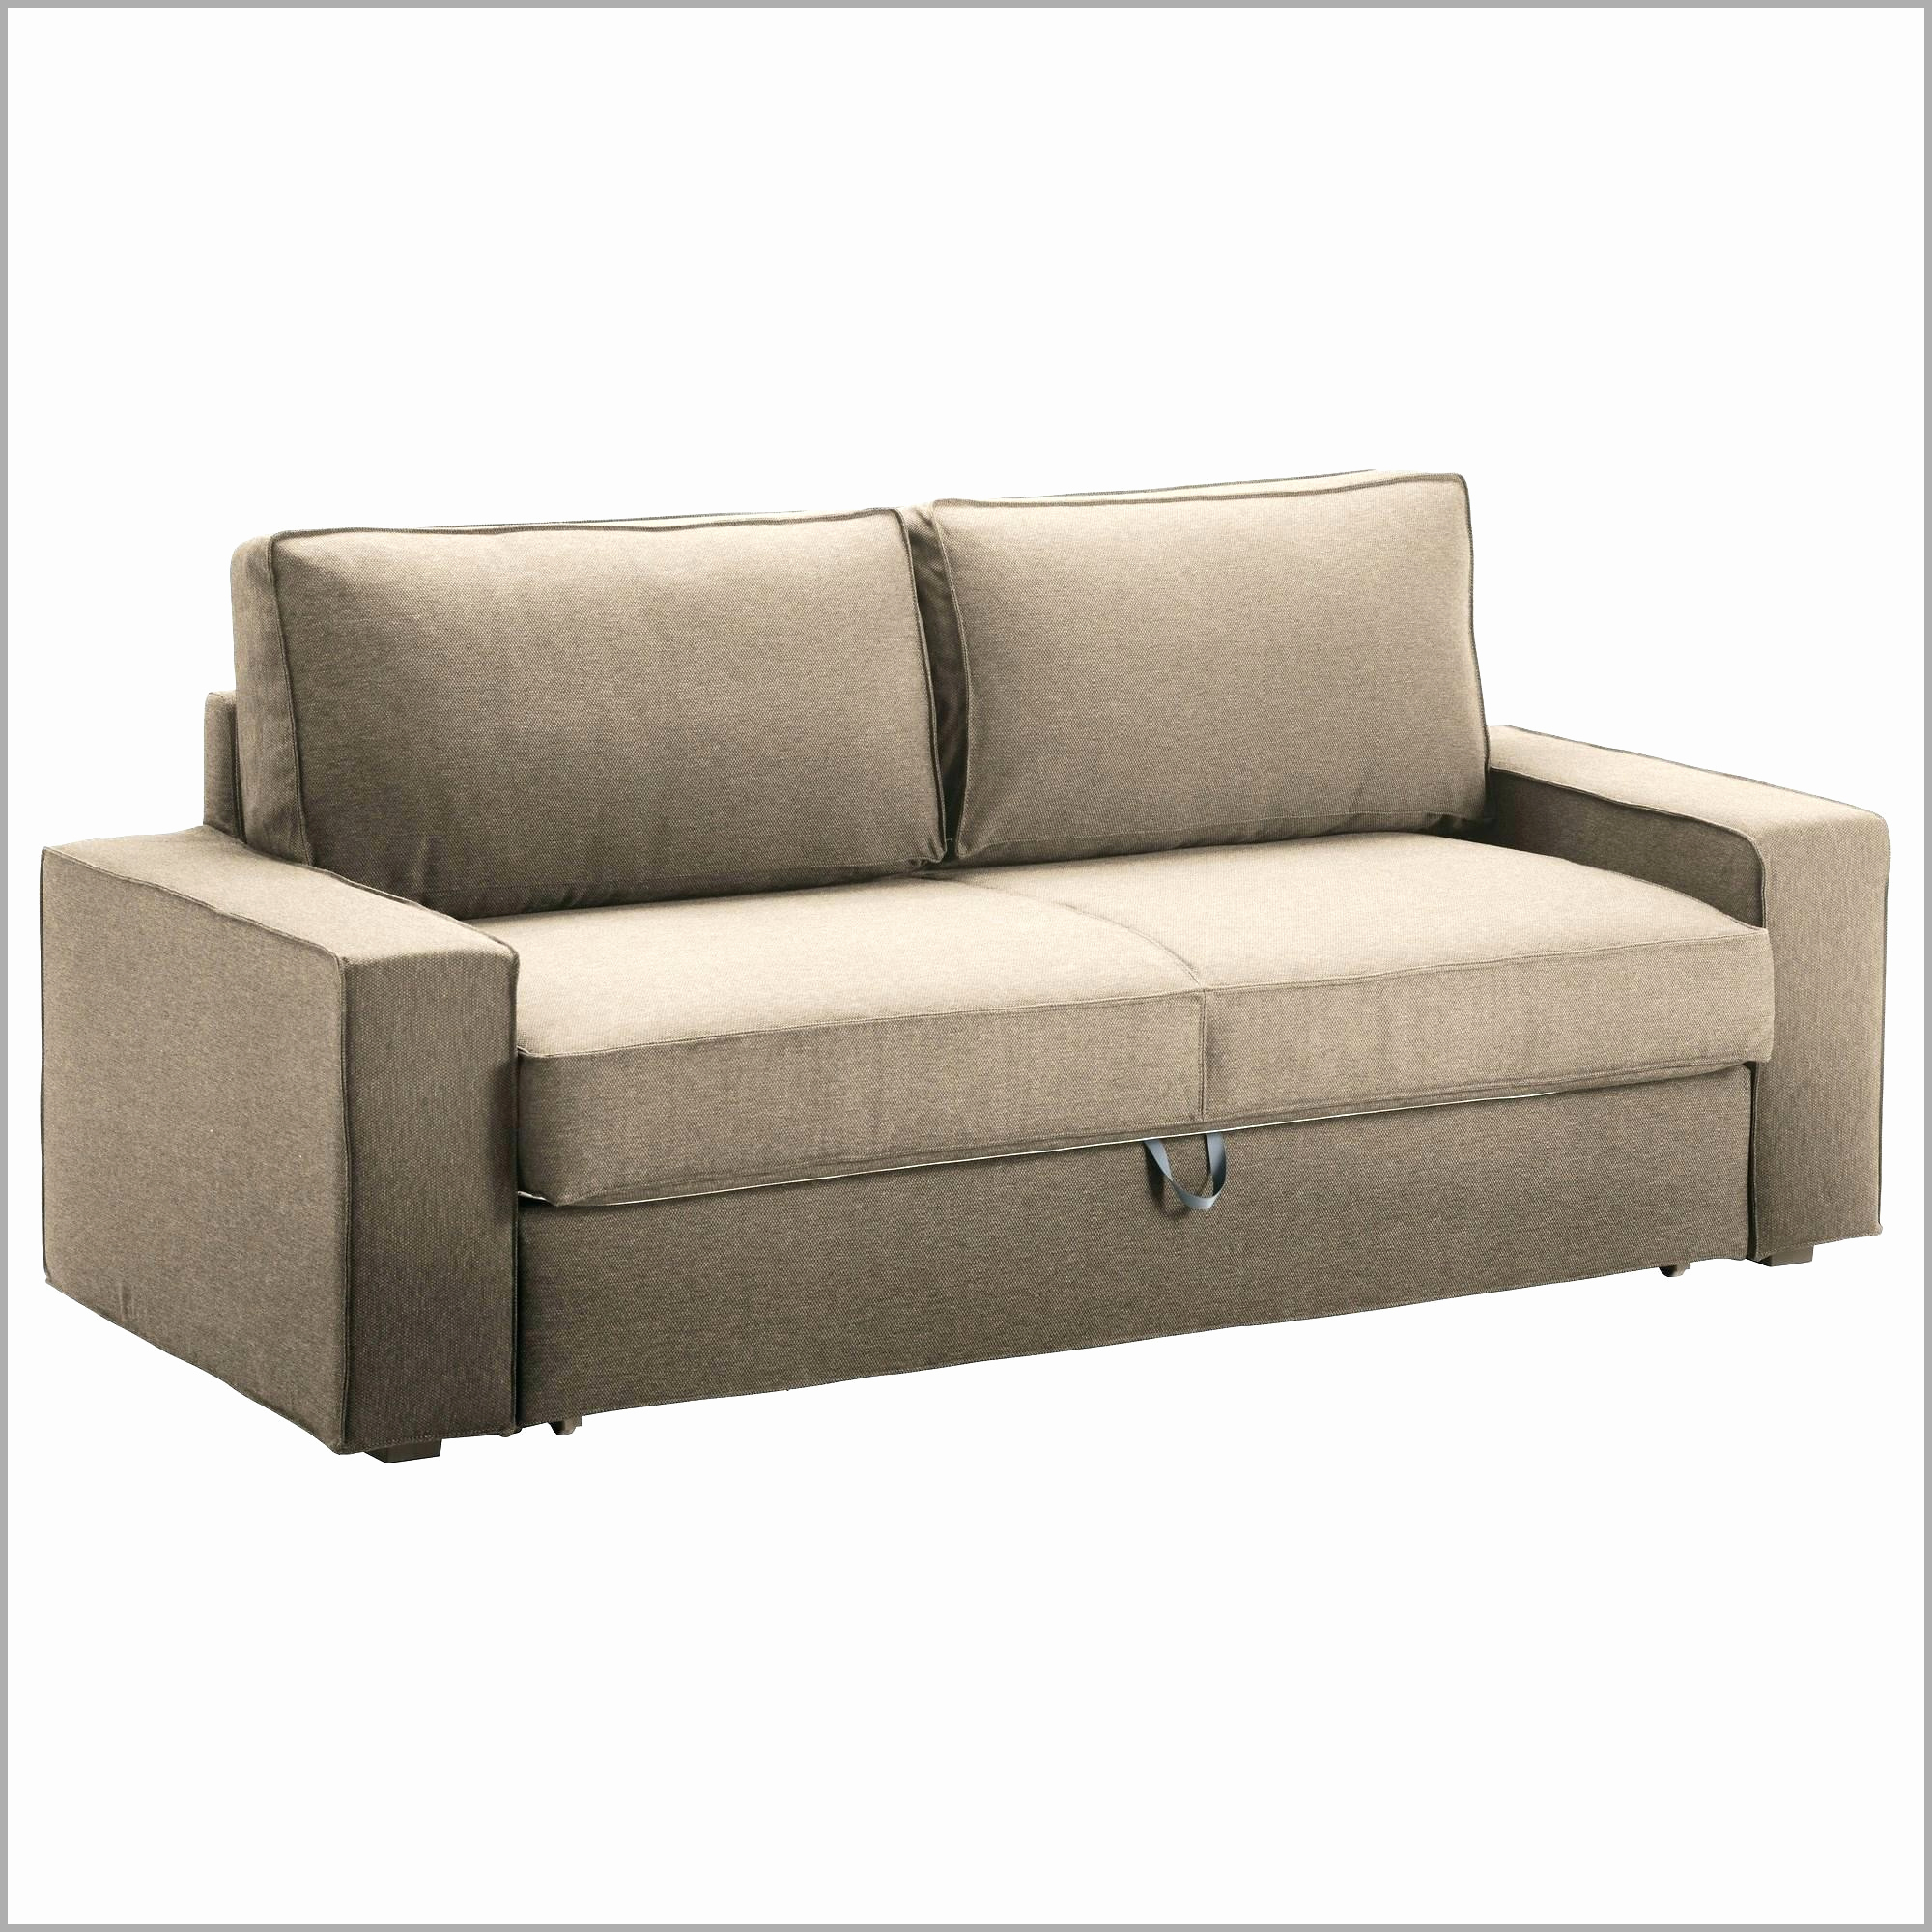 ikea housse bz impressionnant photos bz ikea inspirant. Black Bedroom Furniture Sets. Home Design Ideas